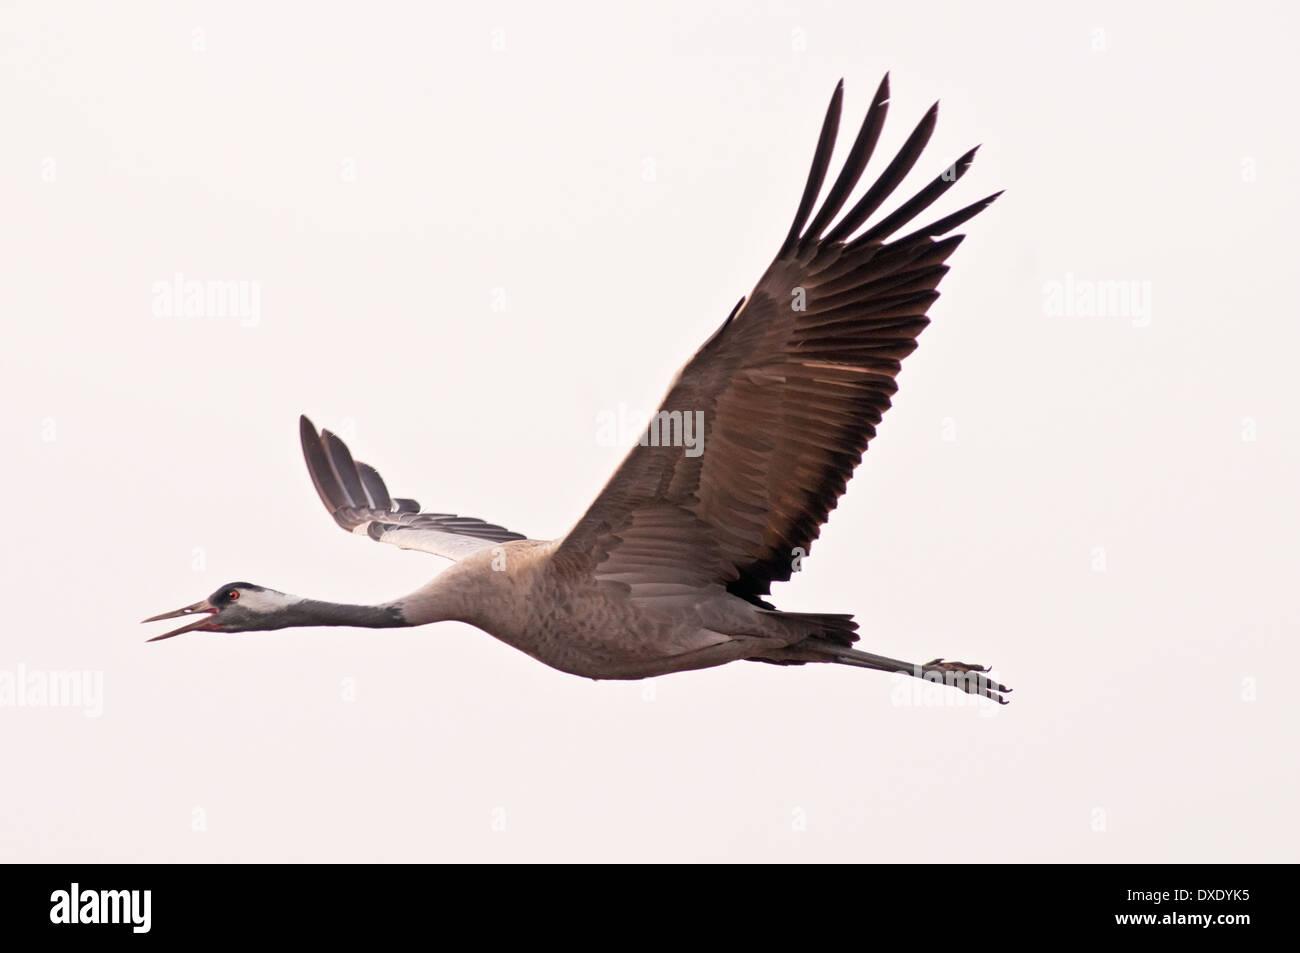 Common Crane, Grus grus,  Flying Stock Photo